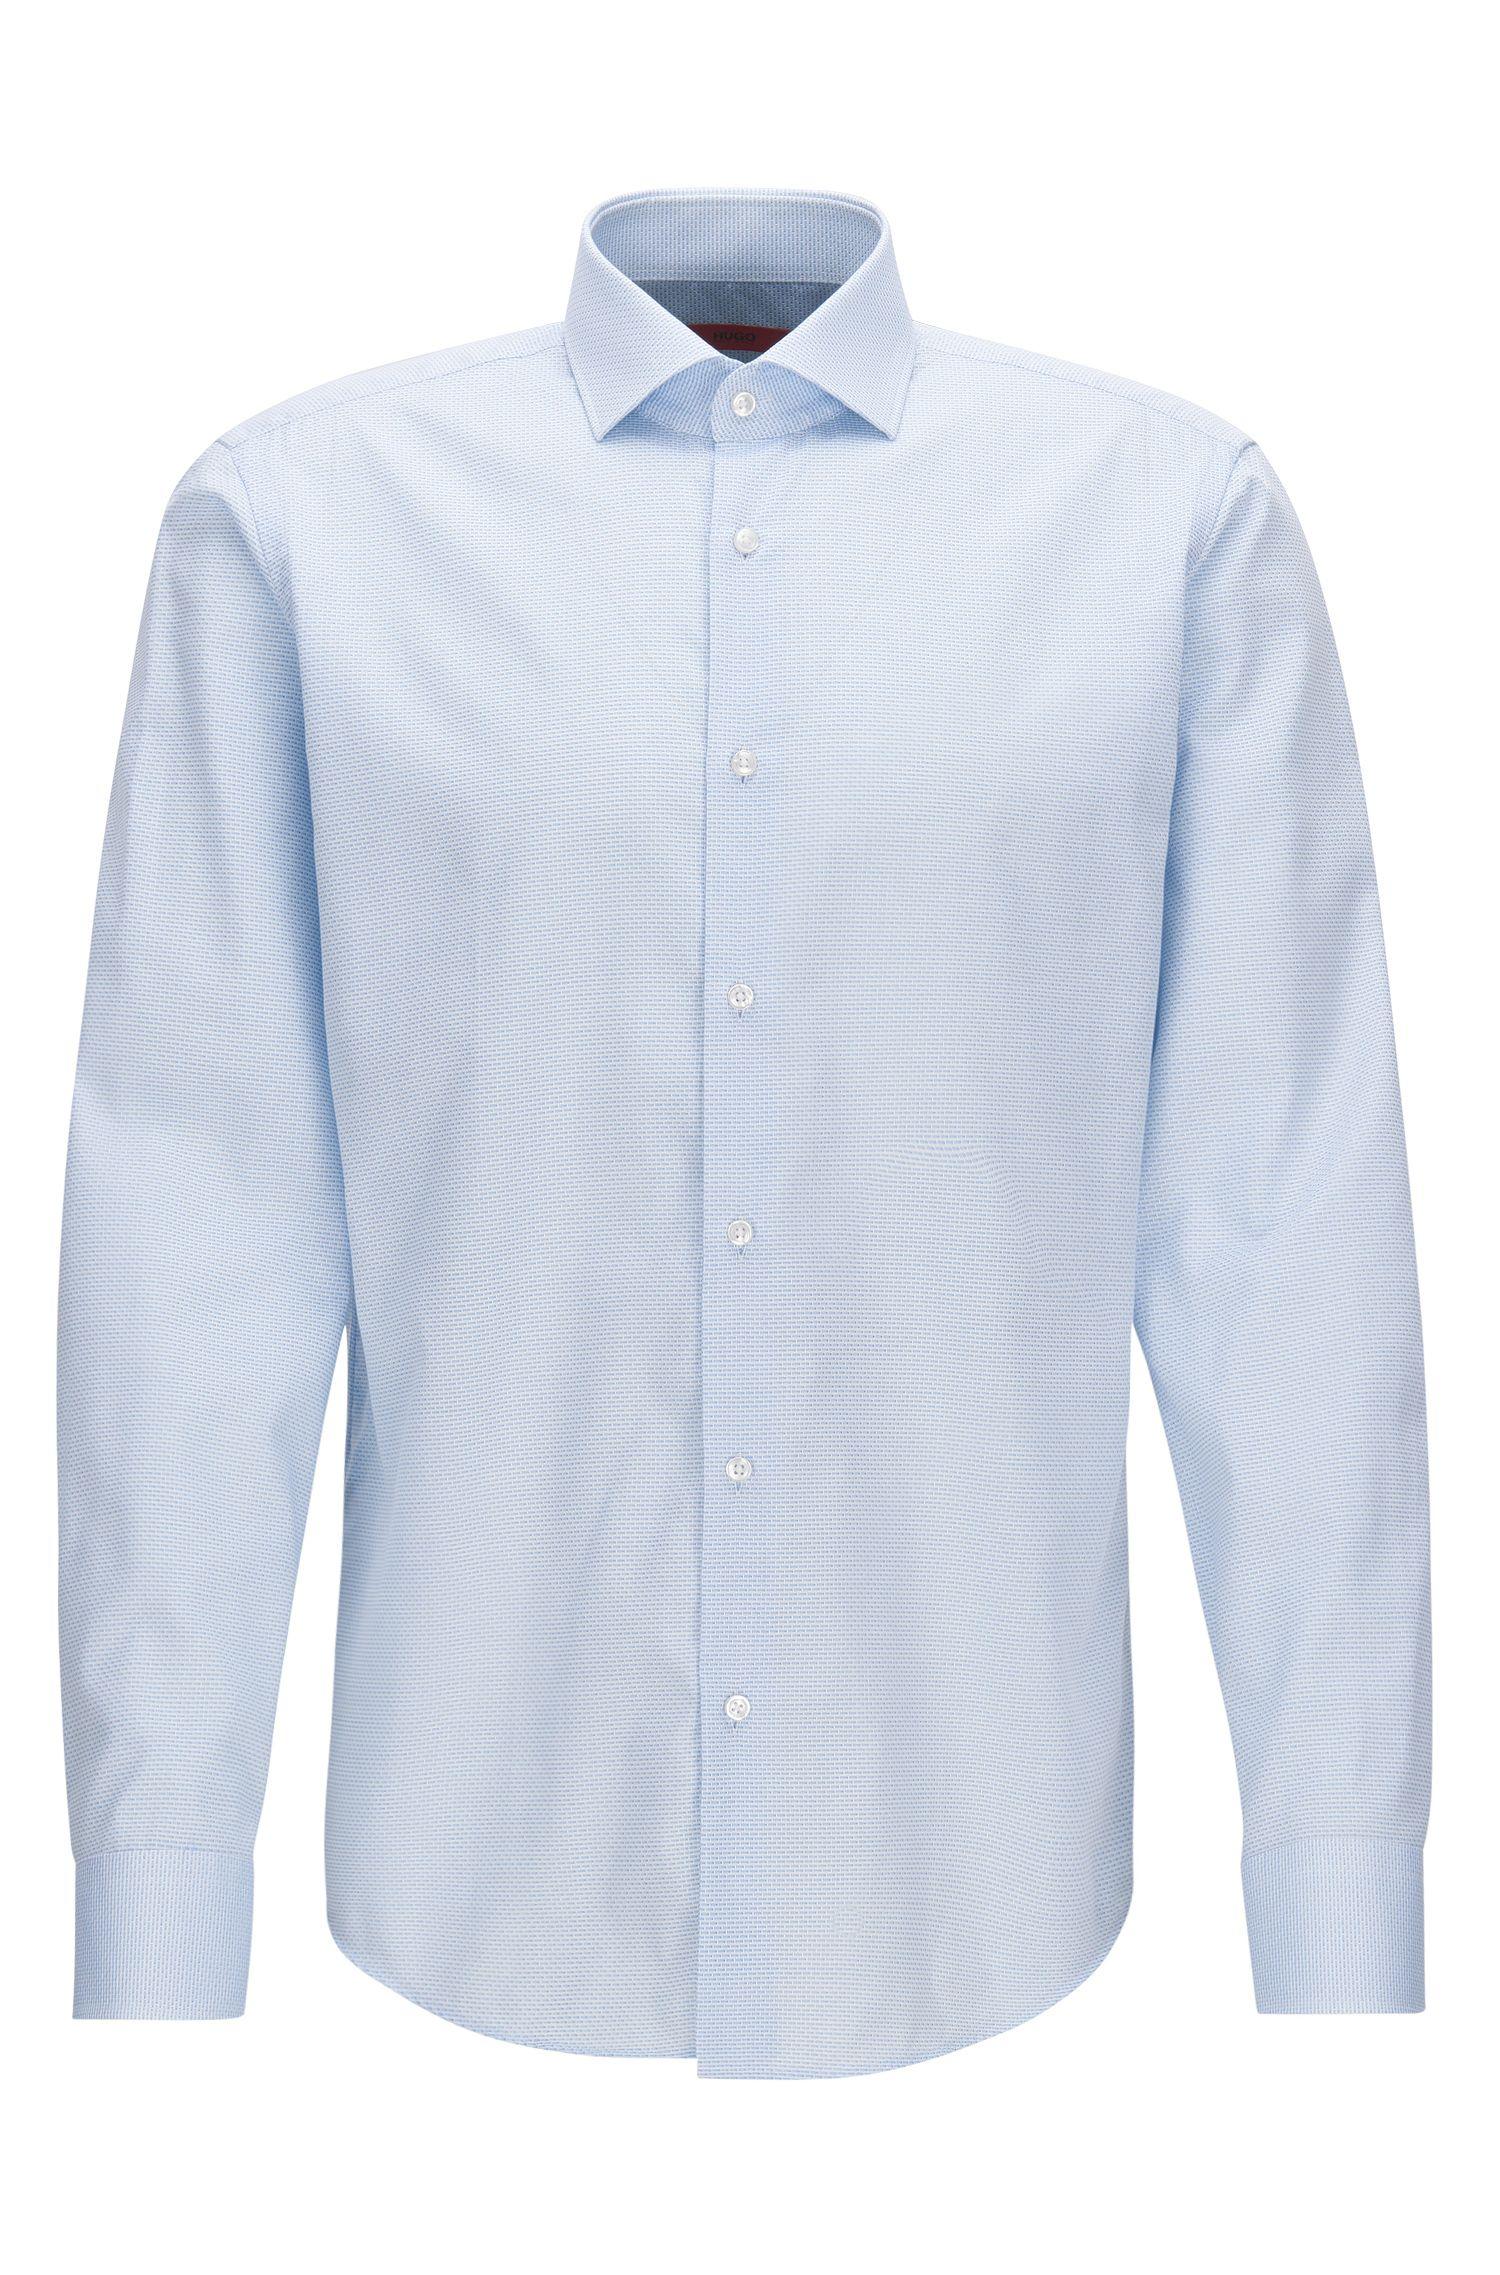 Regular-fit shirt in patterned cotton poplin